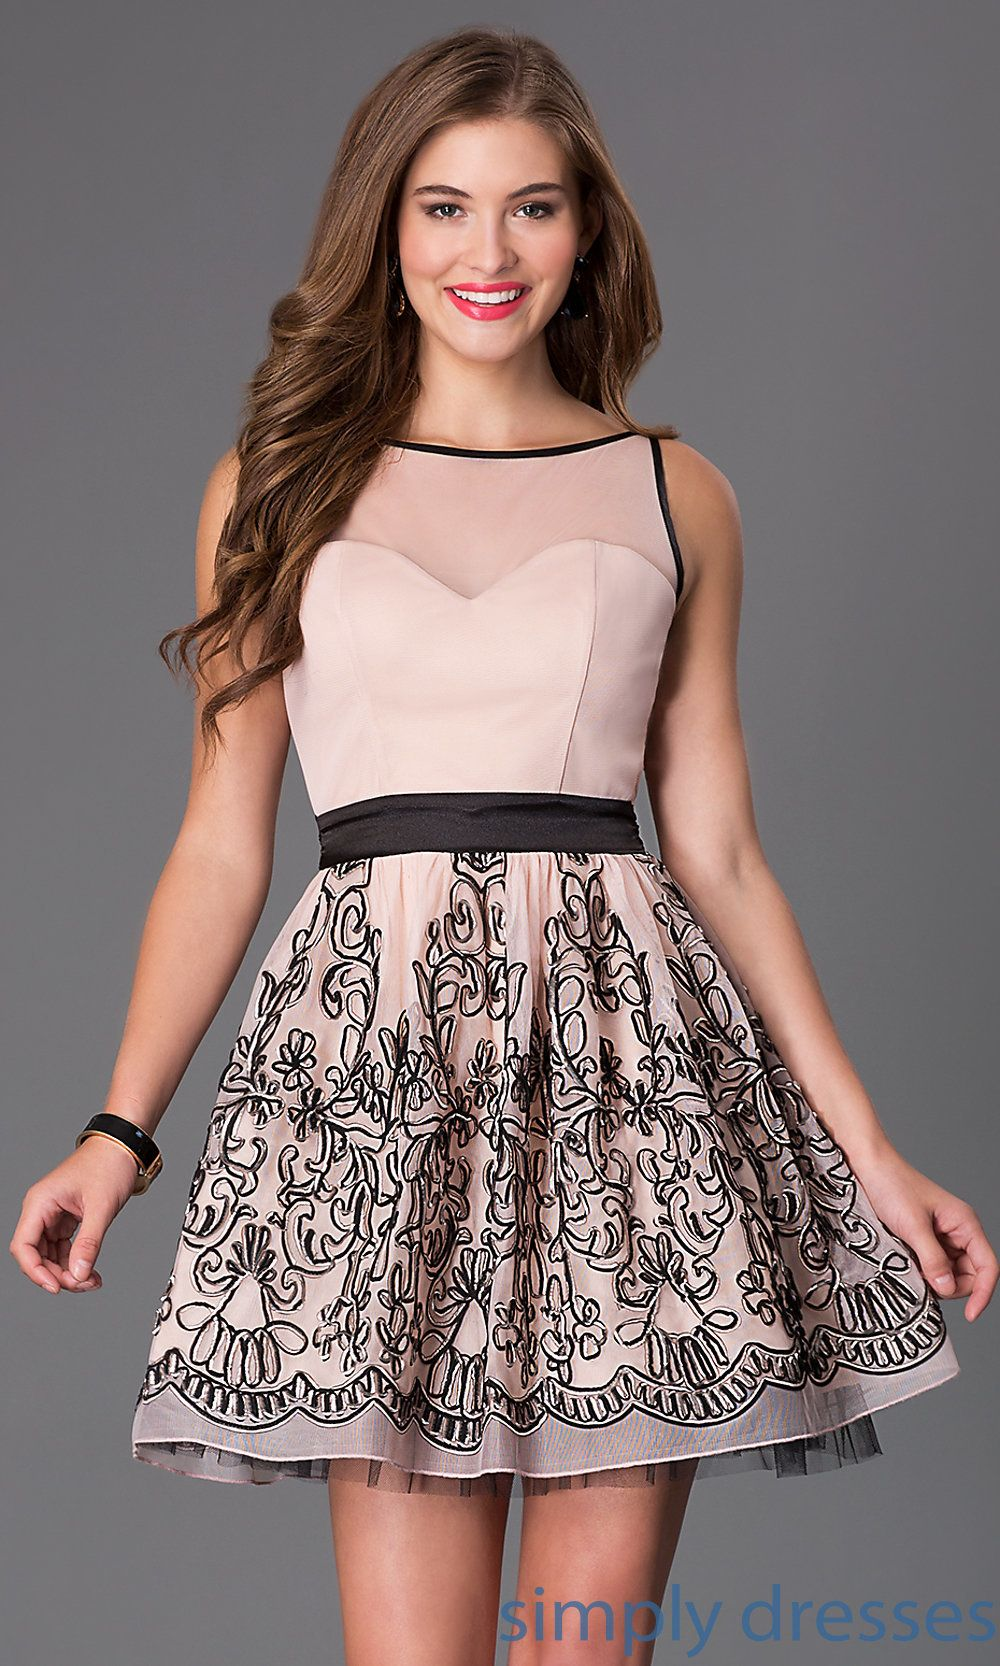 c5e78a89ce10 Shop Simply Dresses for homecoming party dresses